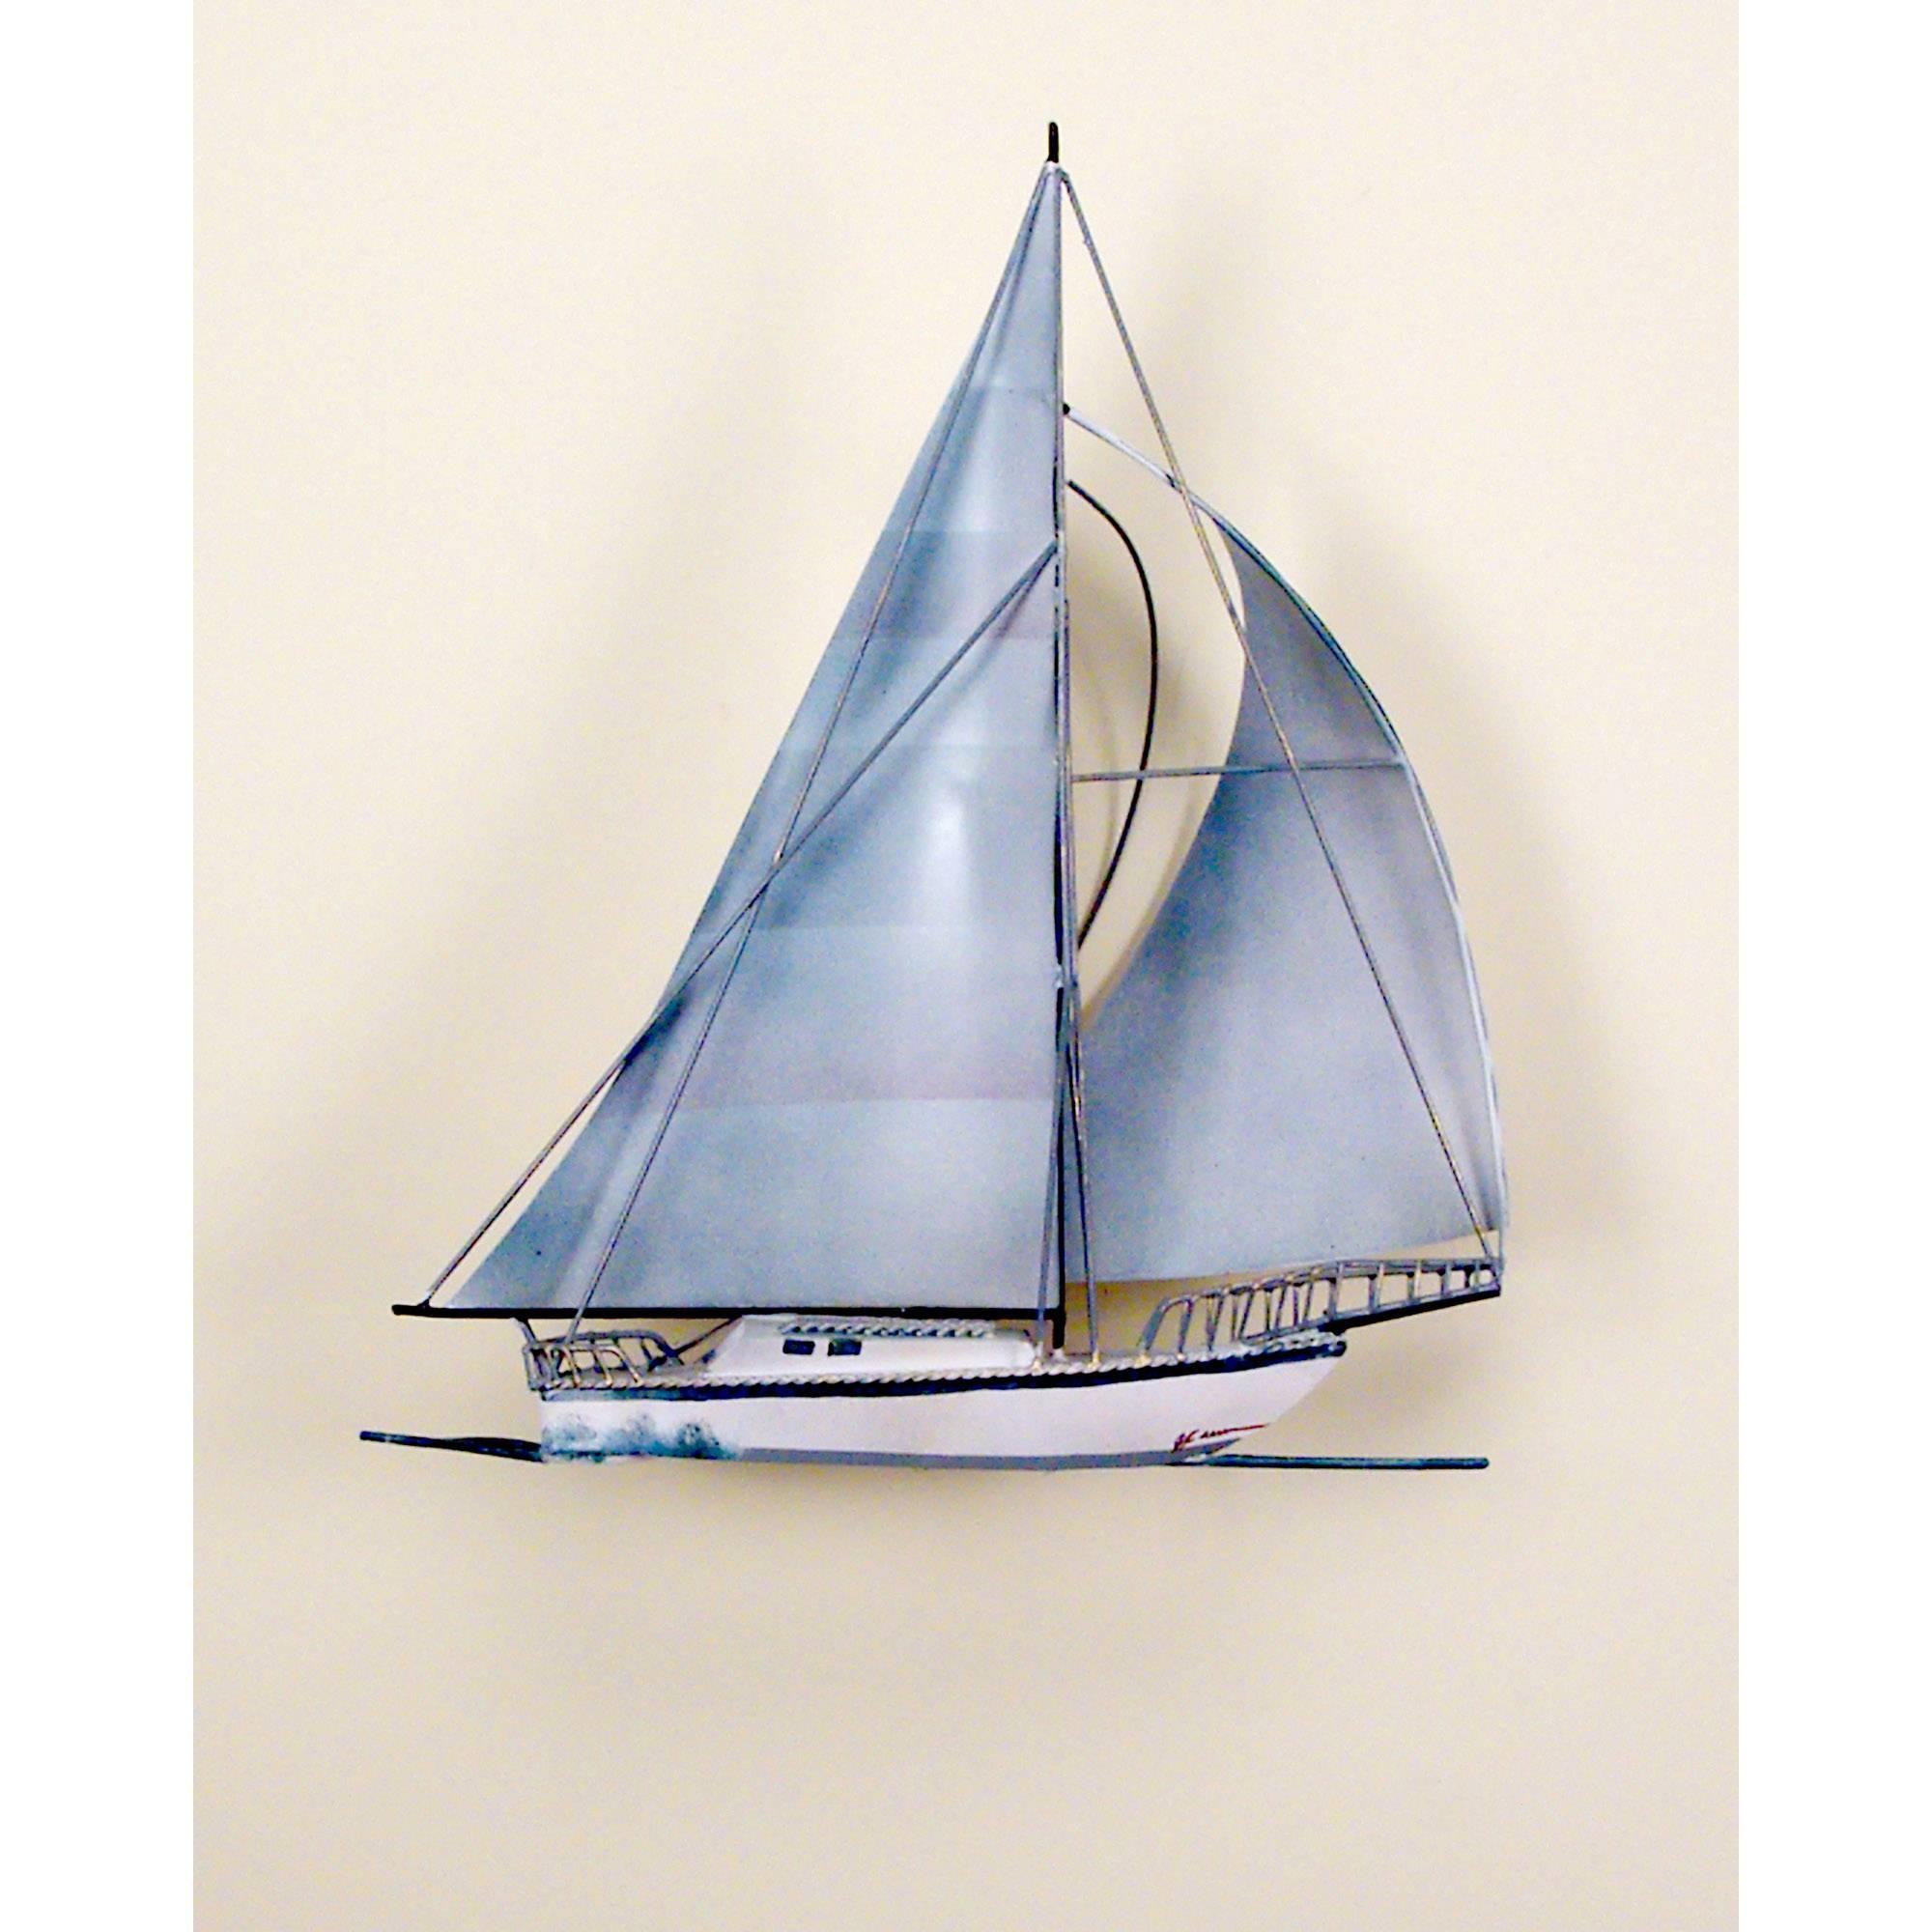 Windjamer Sailboat, Single, Ocean, Boat, Nautical, Sailing In Newest Lighthouse Metal Wall Art (View 7 of 20)